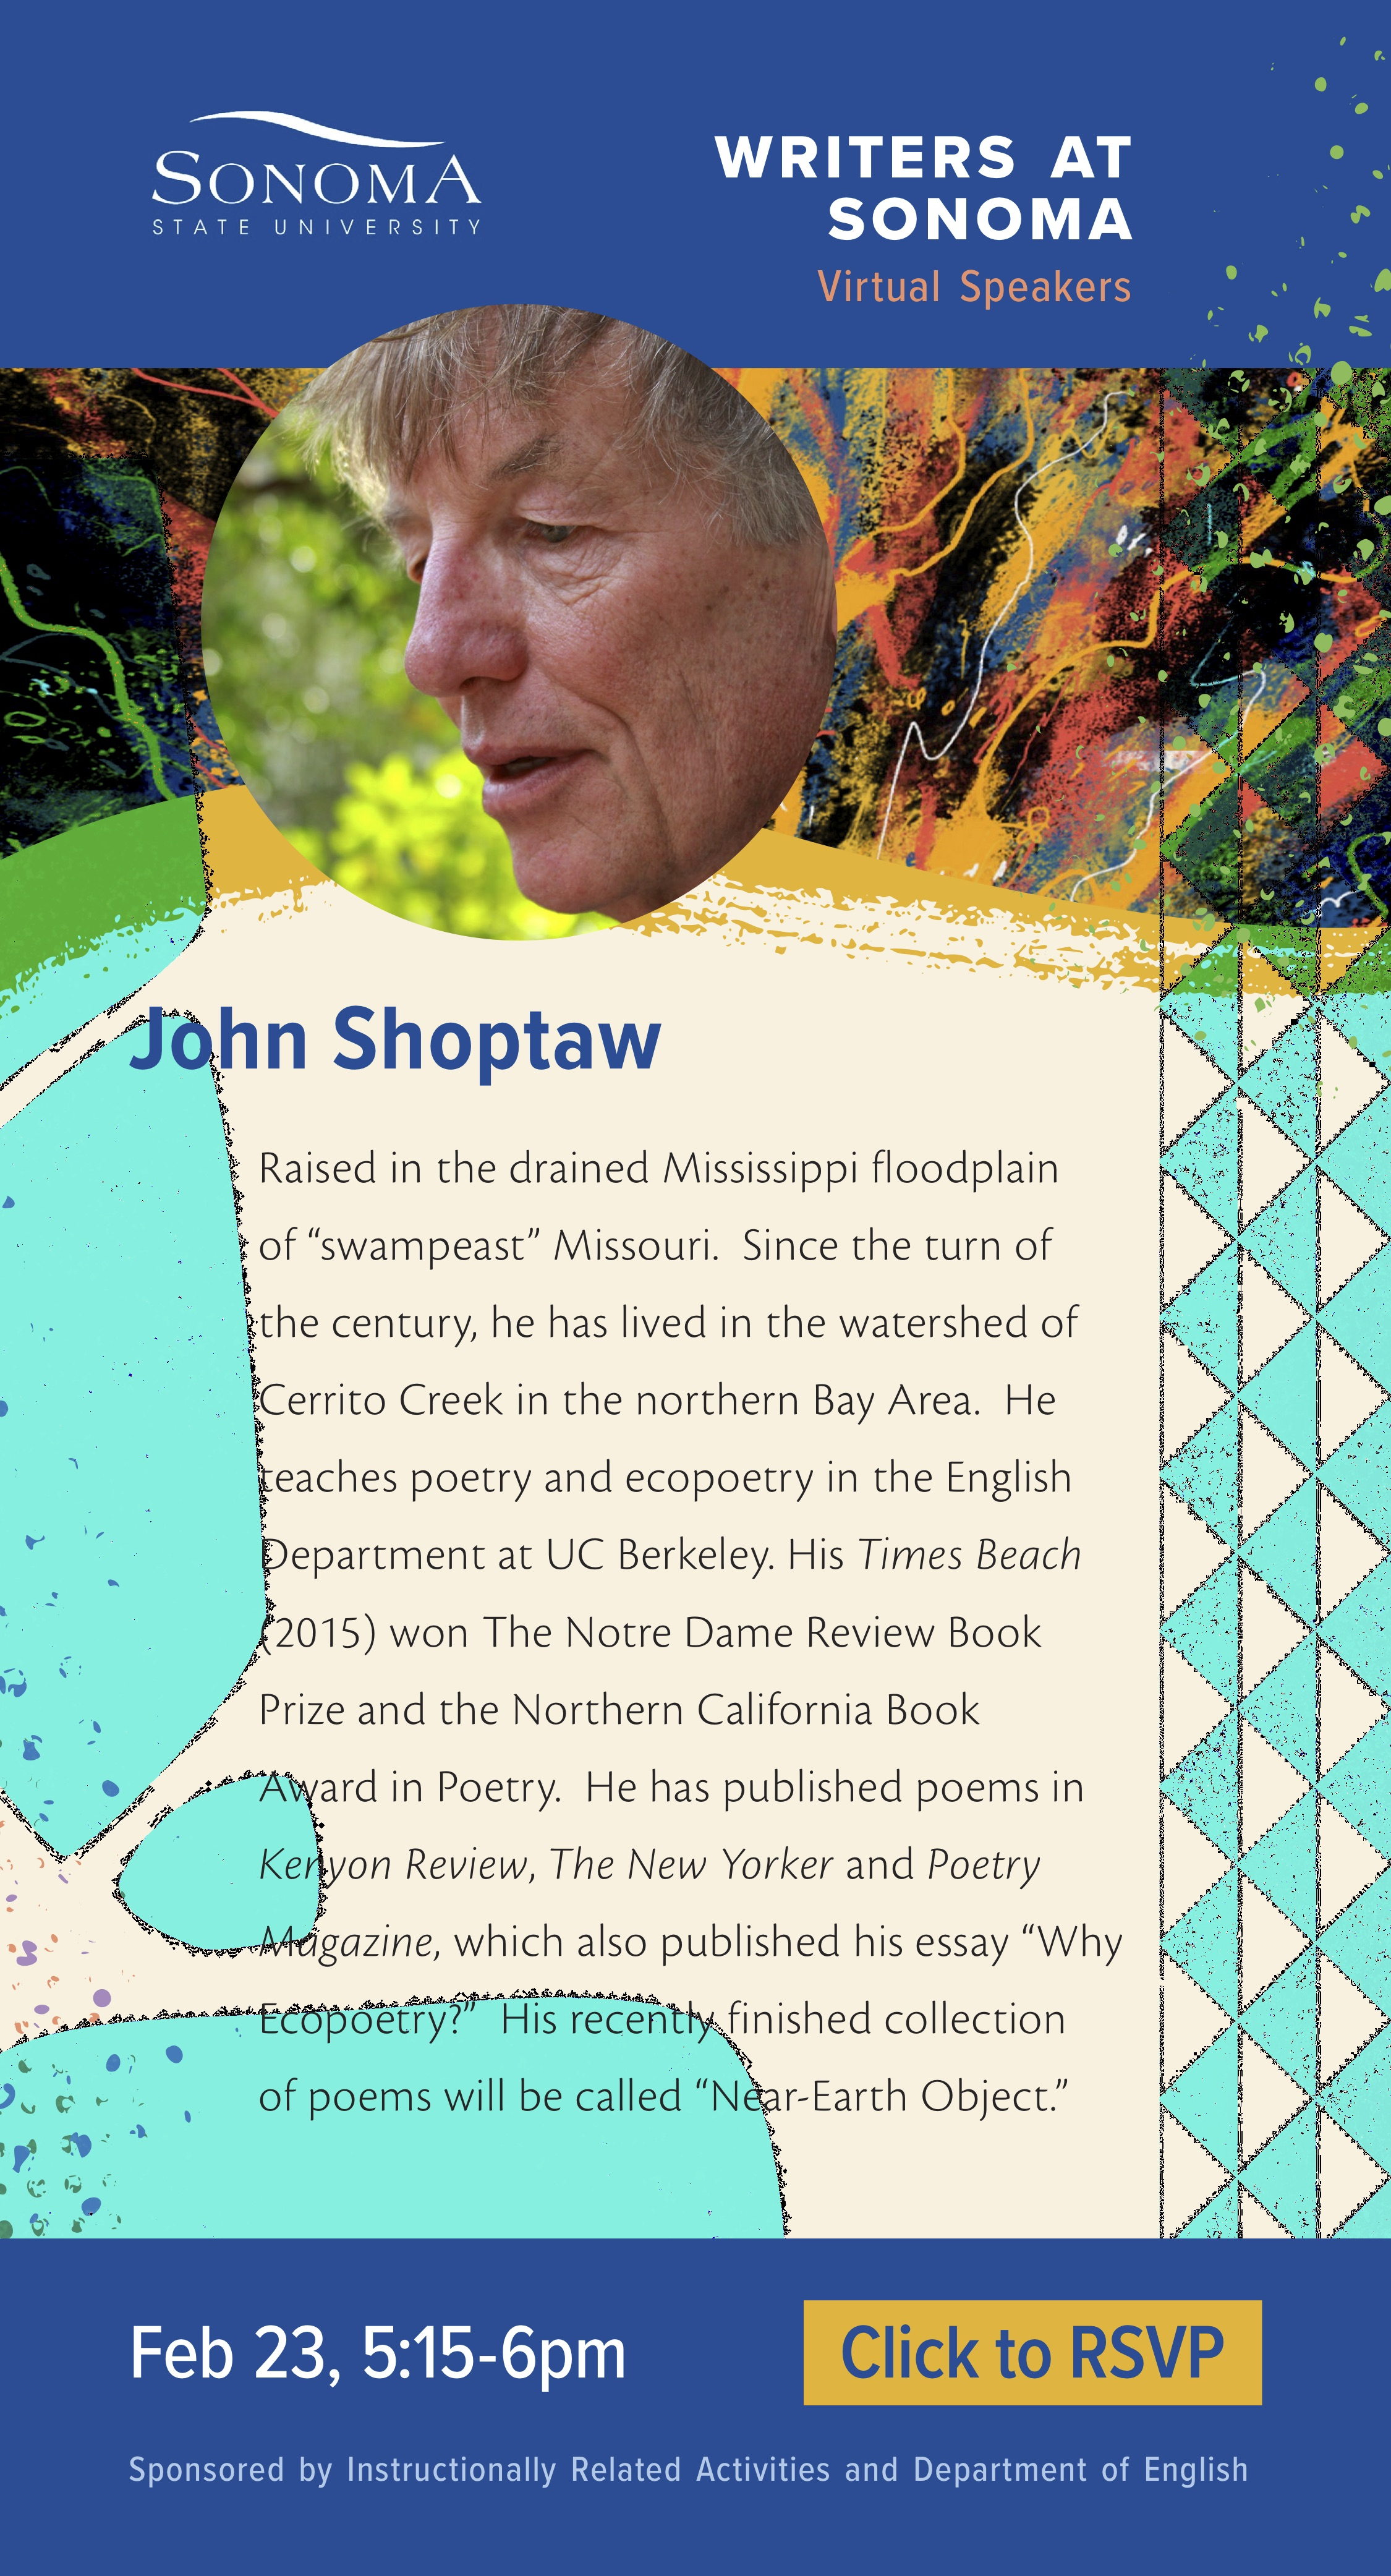 John Shoptaw Writers at Sonoma Virtual Speaker